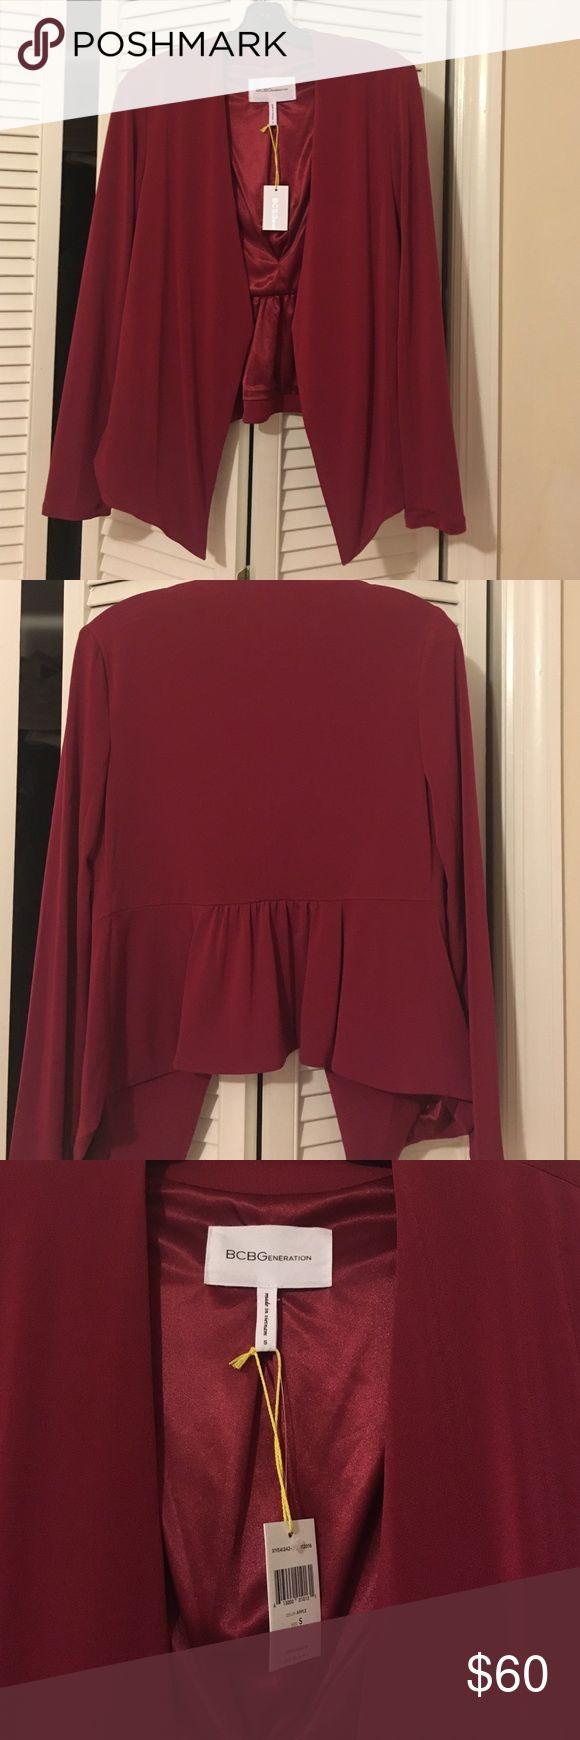 BCBGENERATION BLAZER!!! NWT maroon blazer! Super cute on. BCBGeneration Jackets & Coats Blazers